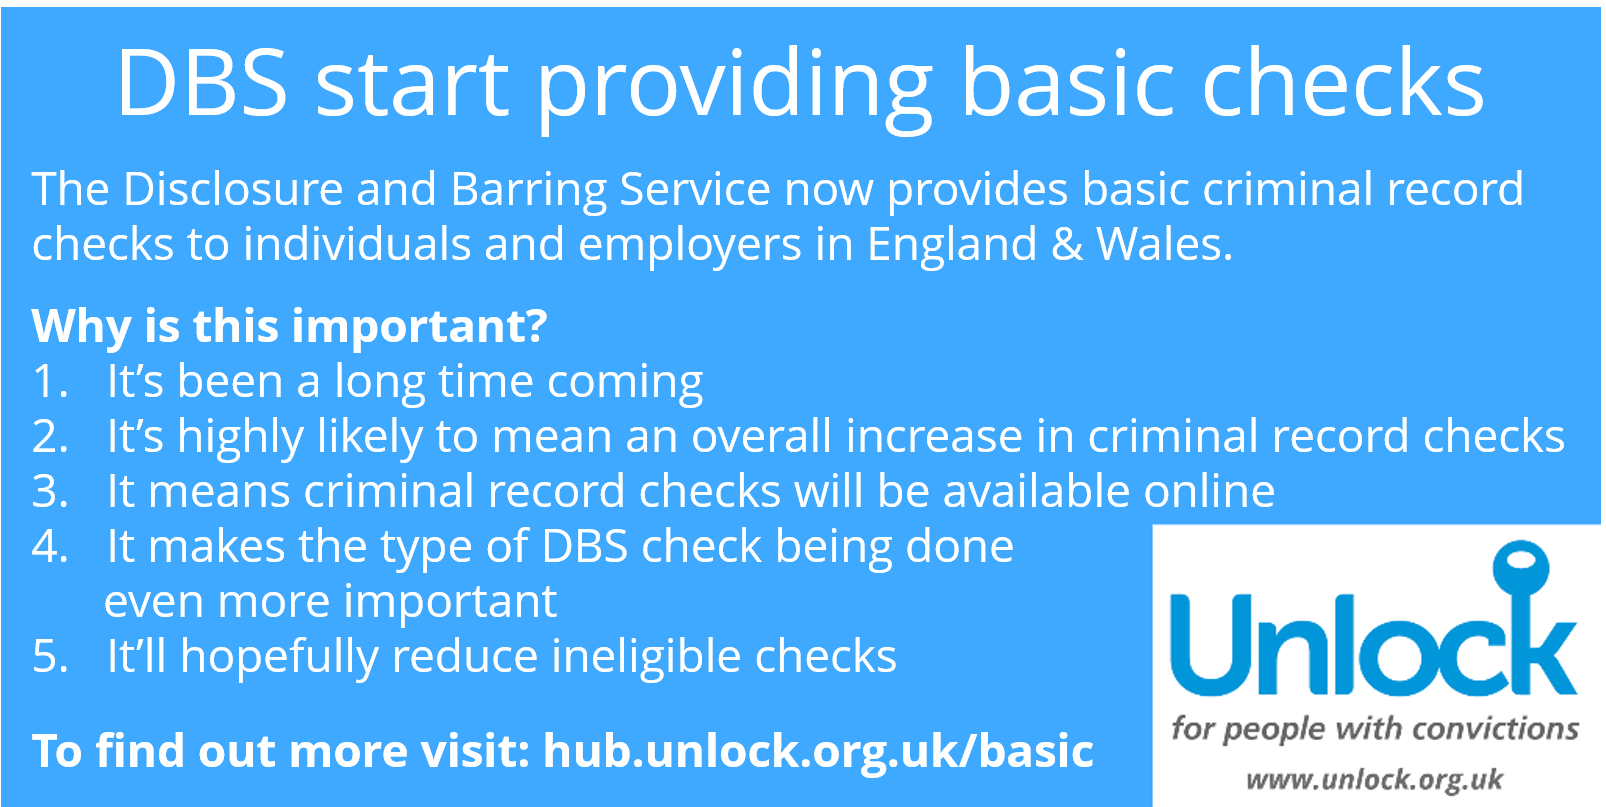 UK CRIMINAL RECORD CHECKS